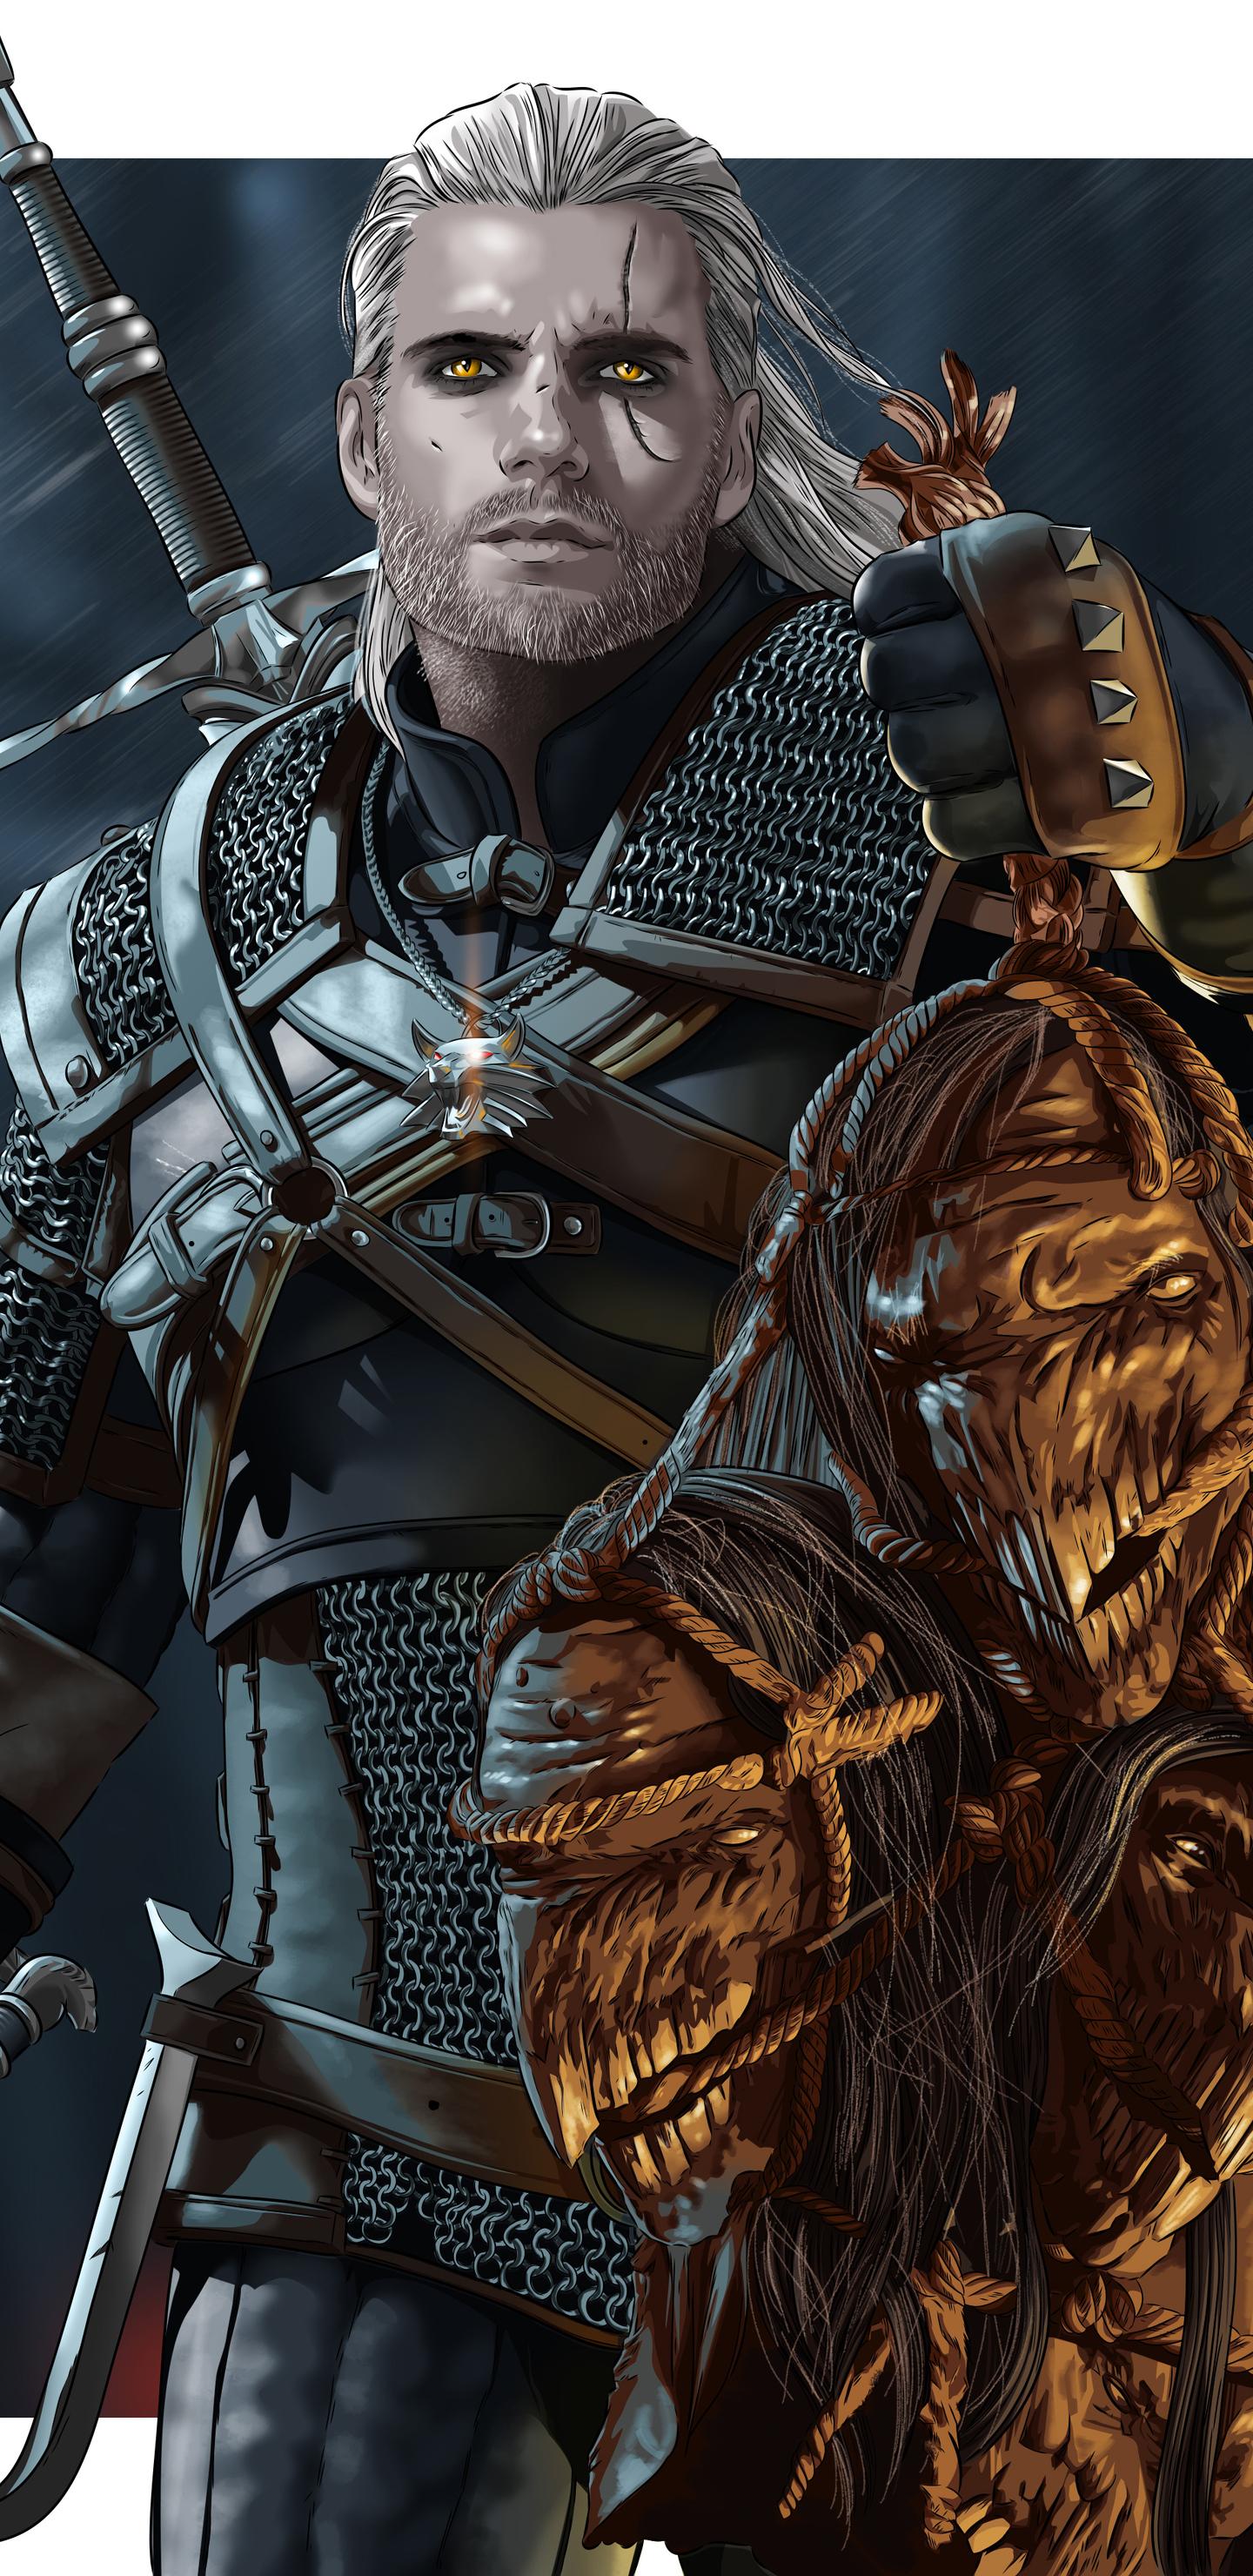 1440x2960 Henry Cavill As Geralt Of Rivia Samsung Galaxy